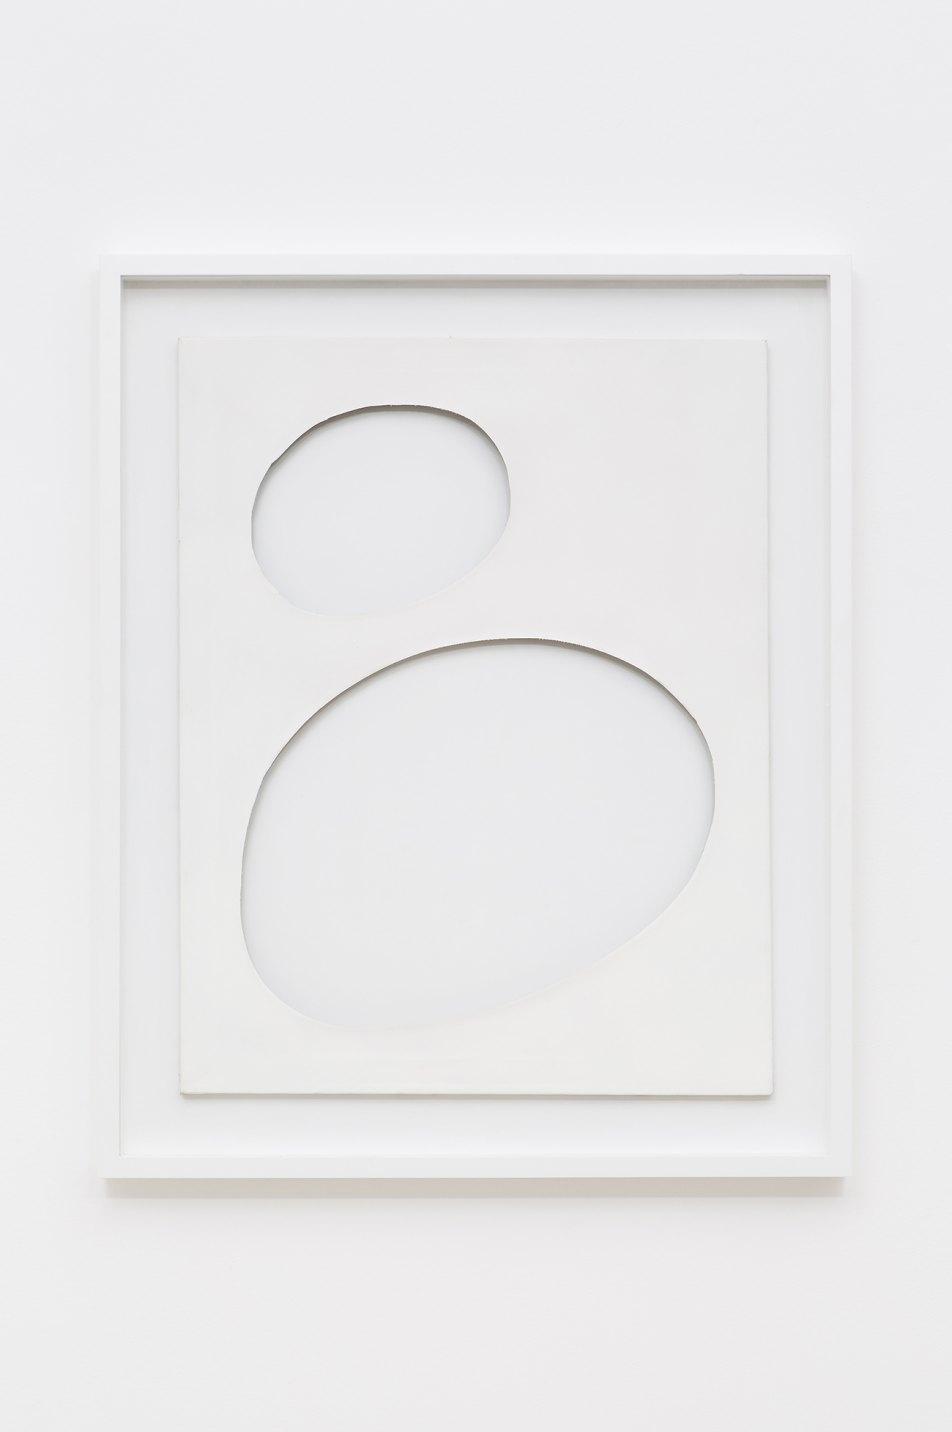 Dadamaino,&nbsp;<em>Volume 070/13</em>, 1960, water-based paint on canvas, 90 × 70 cm - Mendes Wood DM